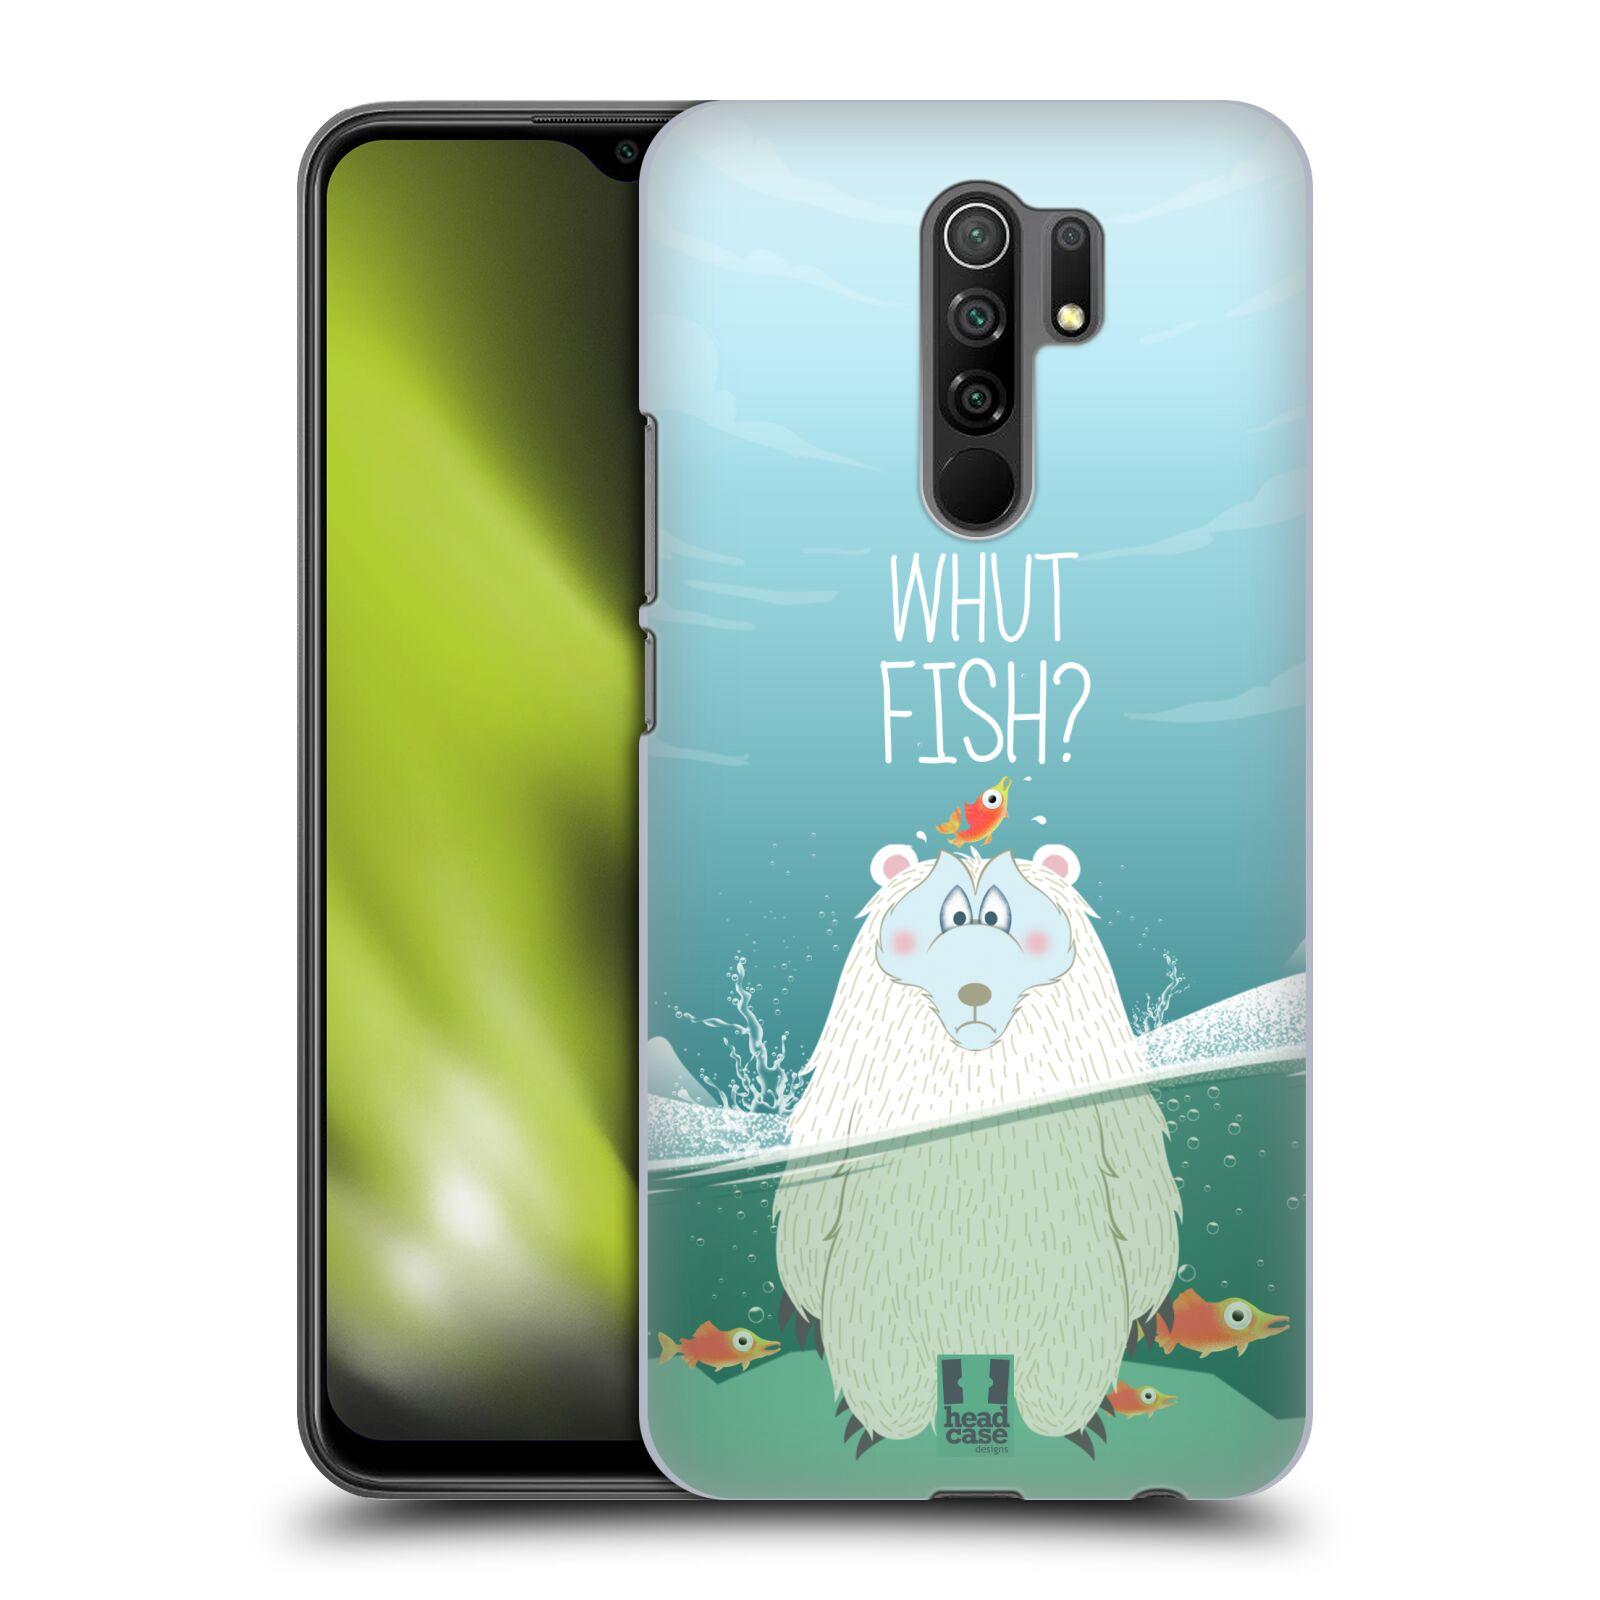 Plastové pouzdro na mobil Xiaomi Redmi 9 - Head Case - Medvěd Whut Fish?